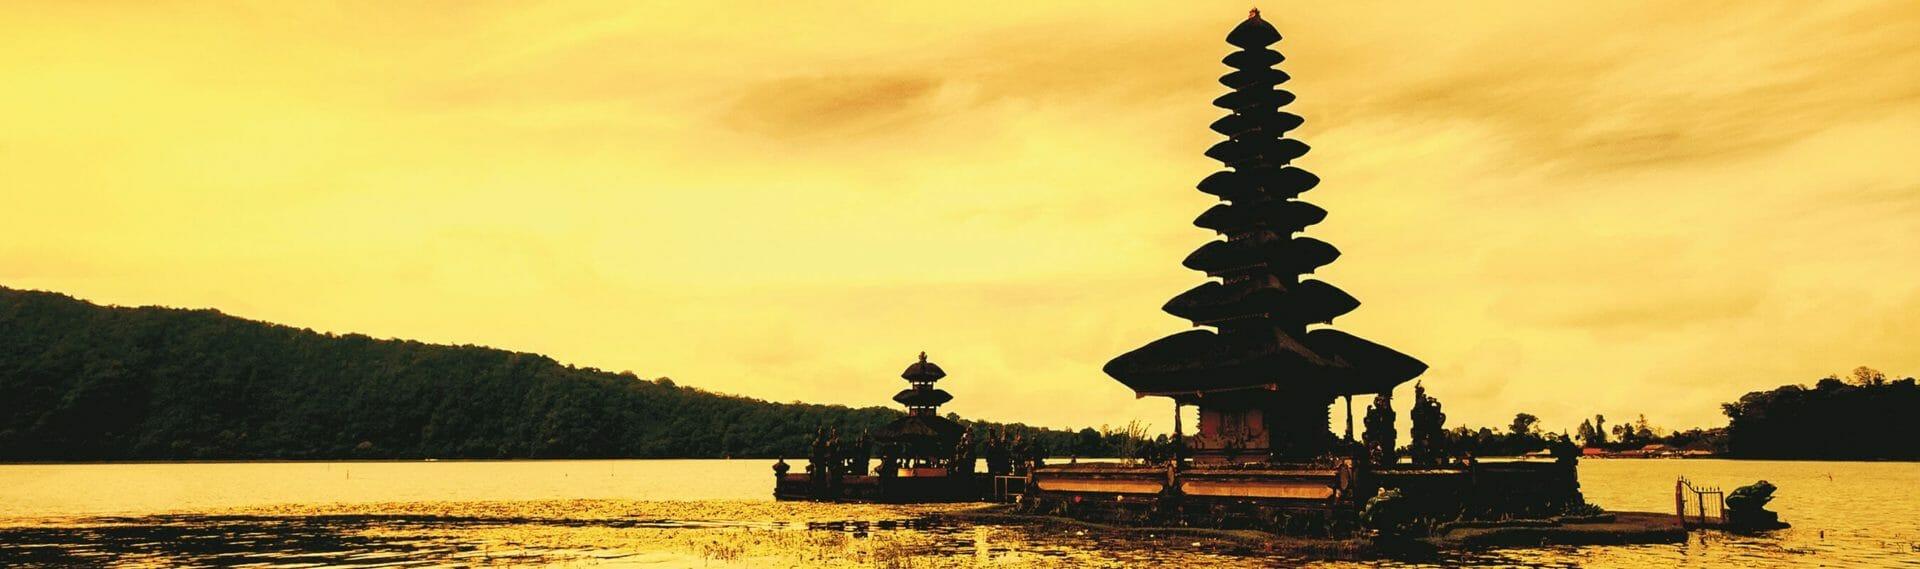 Bali_LacBratan